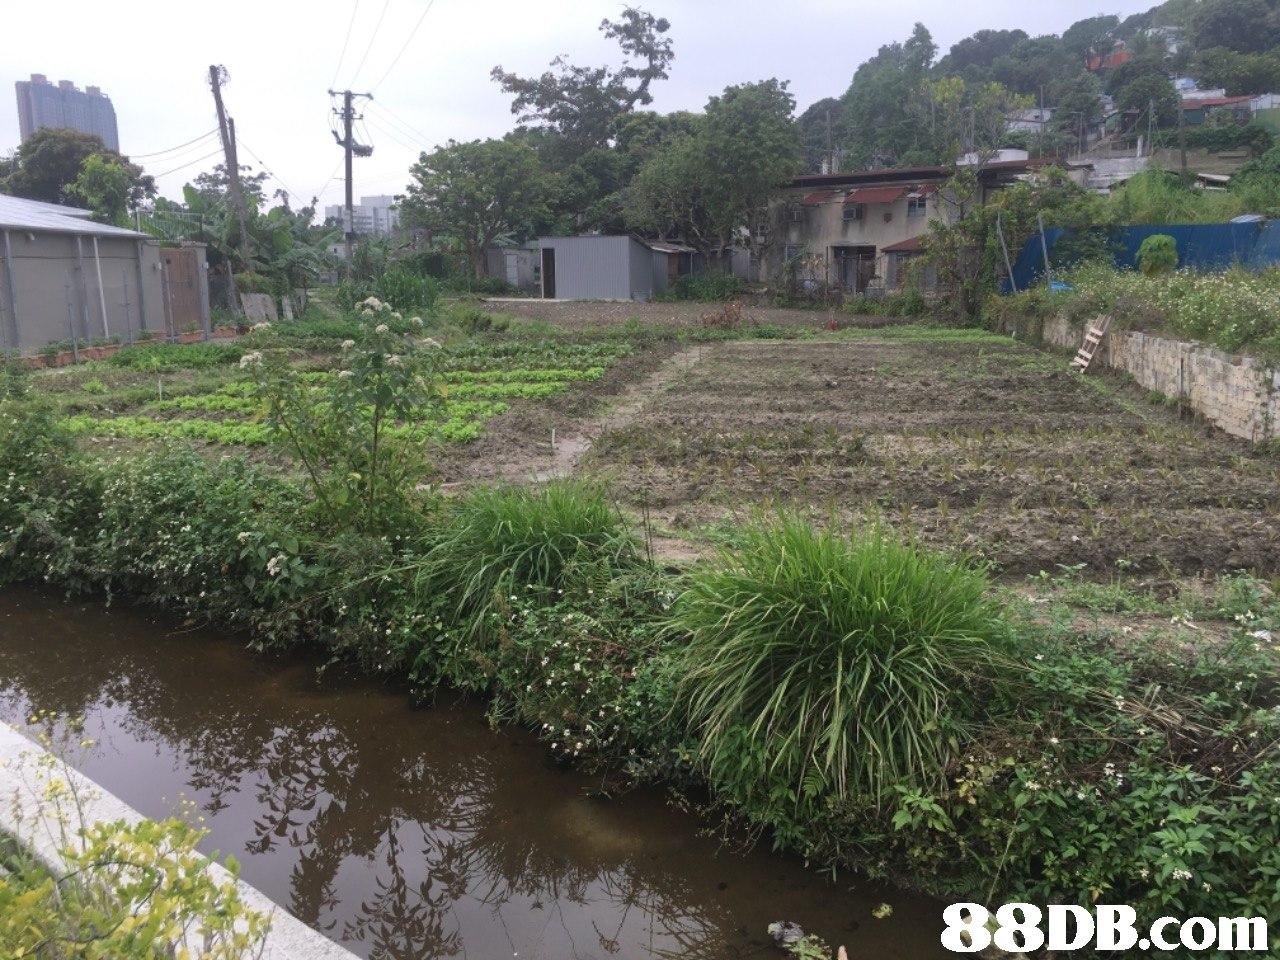 Waterway,Land lot,Water resources,Bank,Property